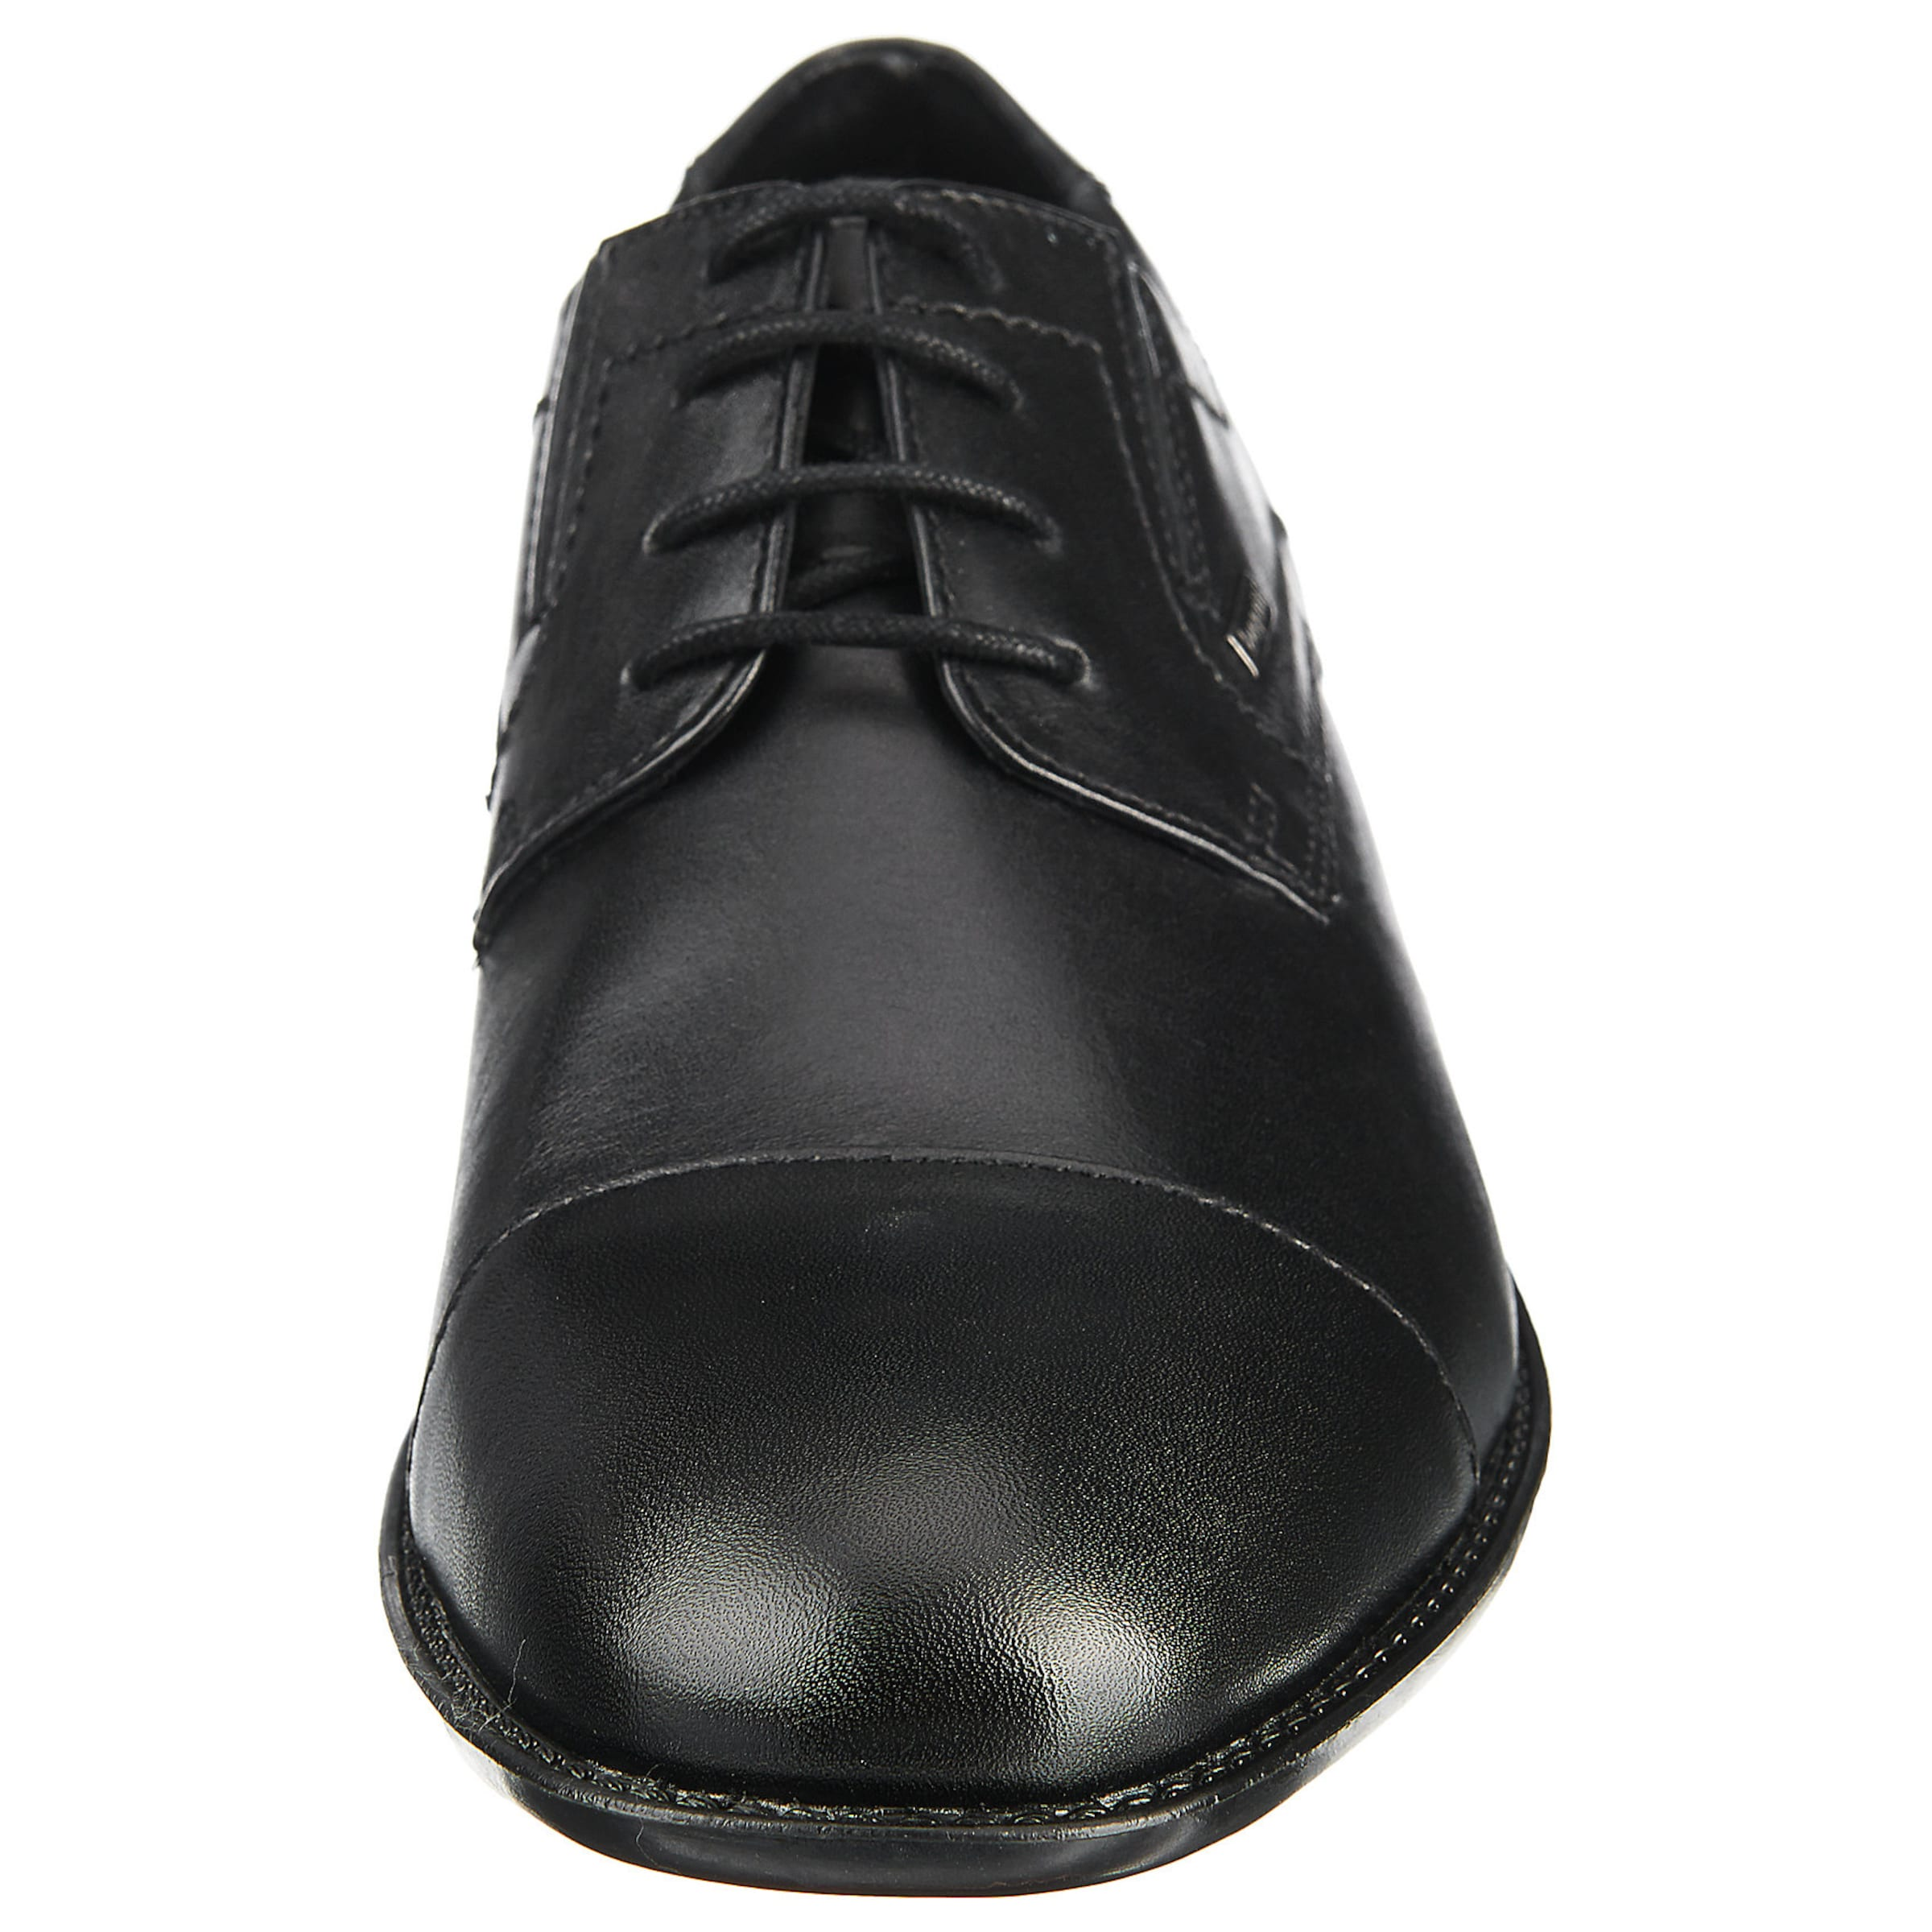 Schwarz Bugatti Schwarz Bugatti Business In Bugatti Schuhe Schuhe In Business Nnkw8OX0P